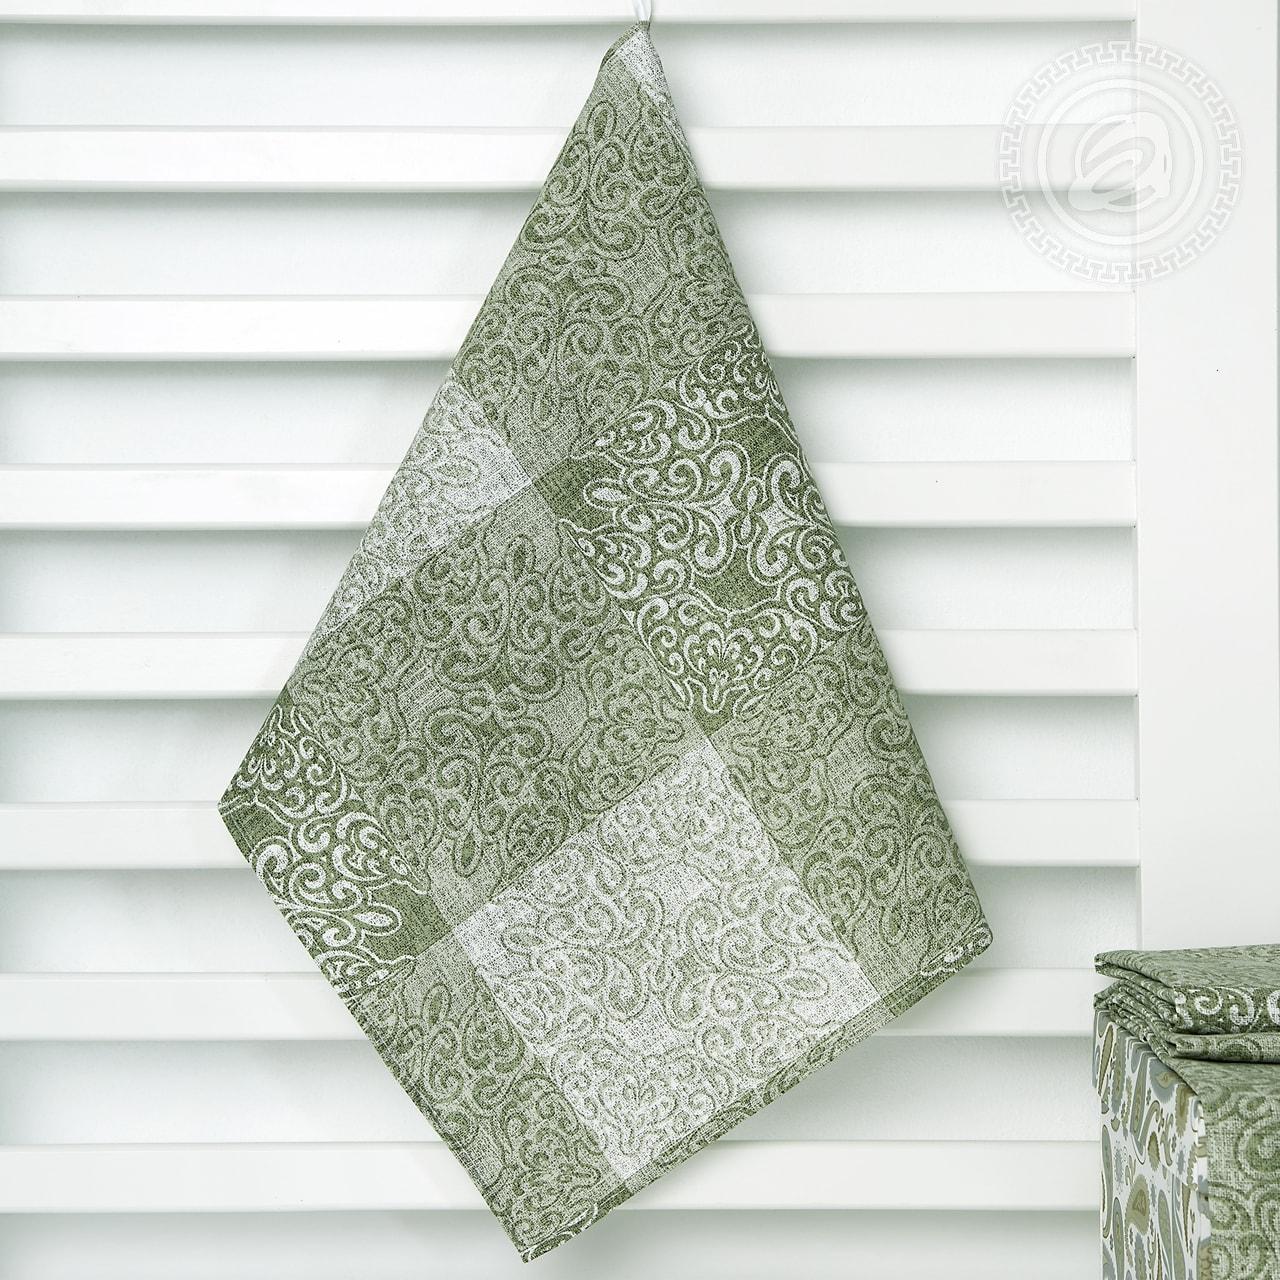 Кухонные полотенца от Grandstock